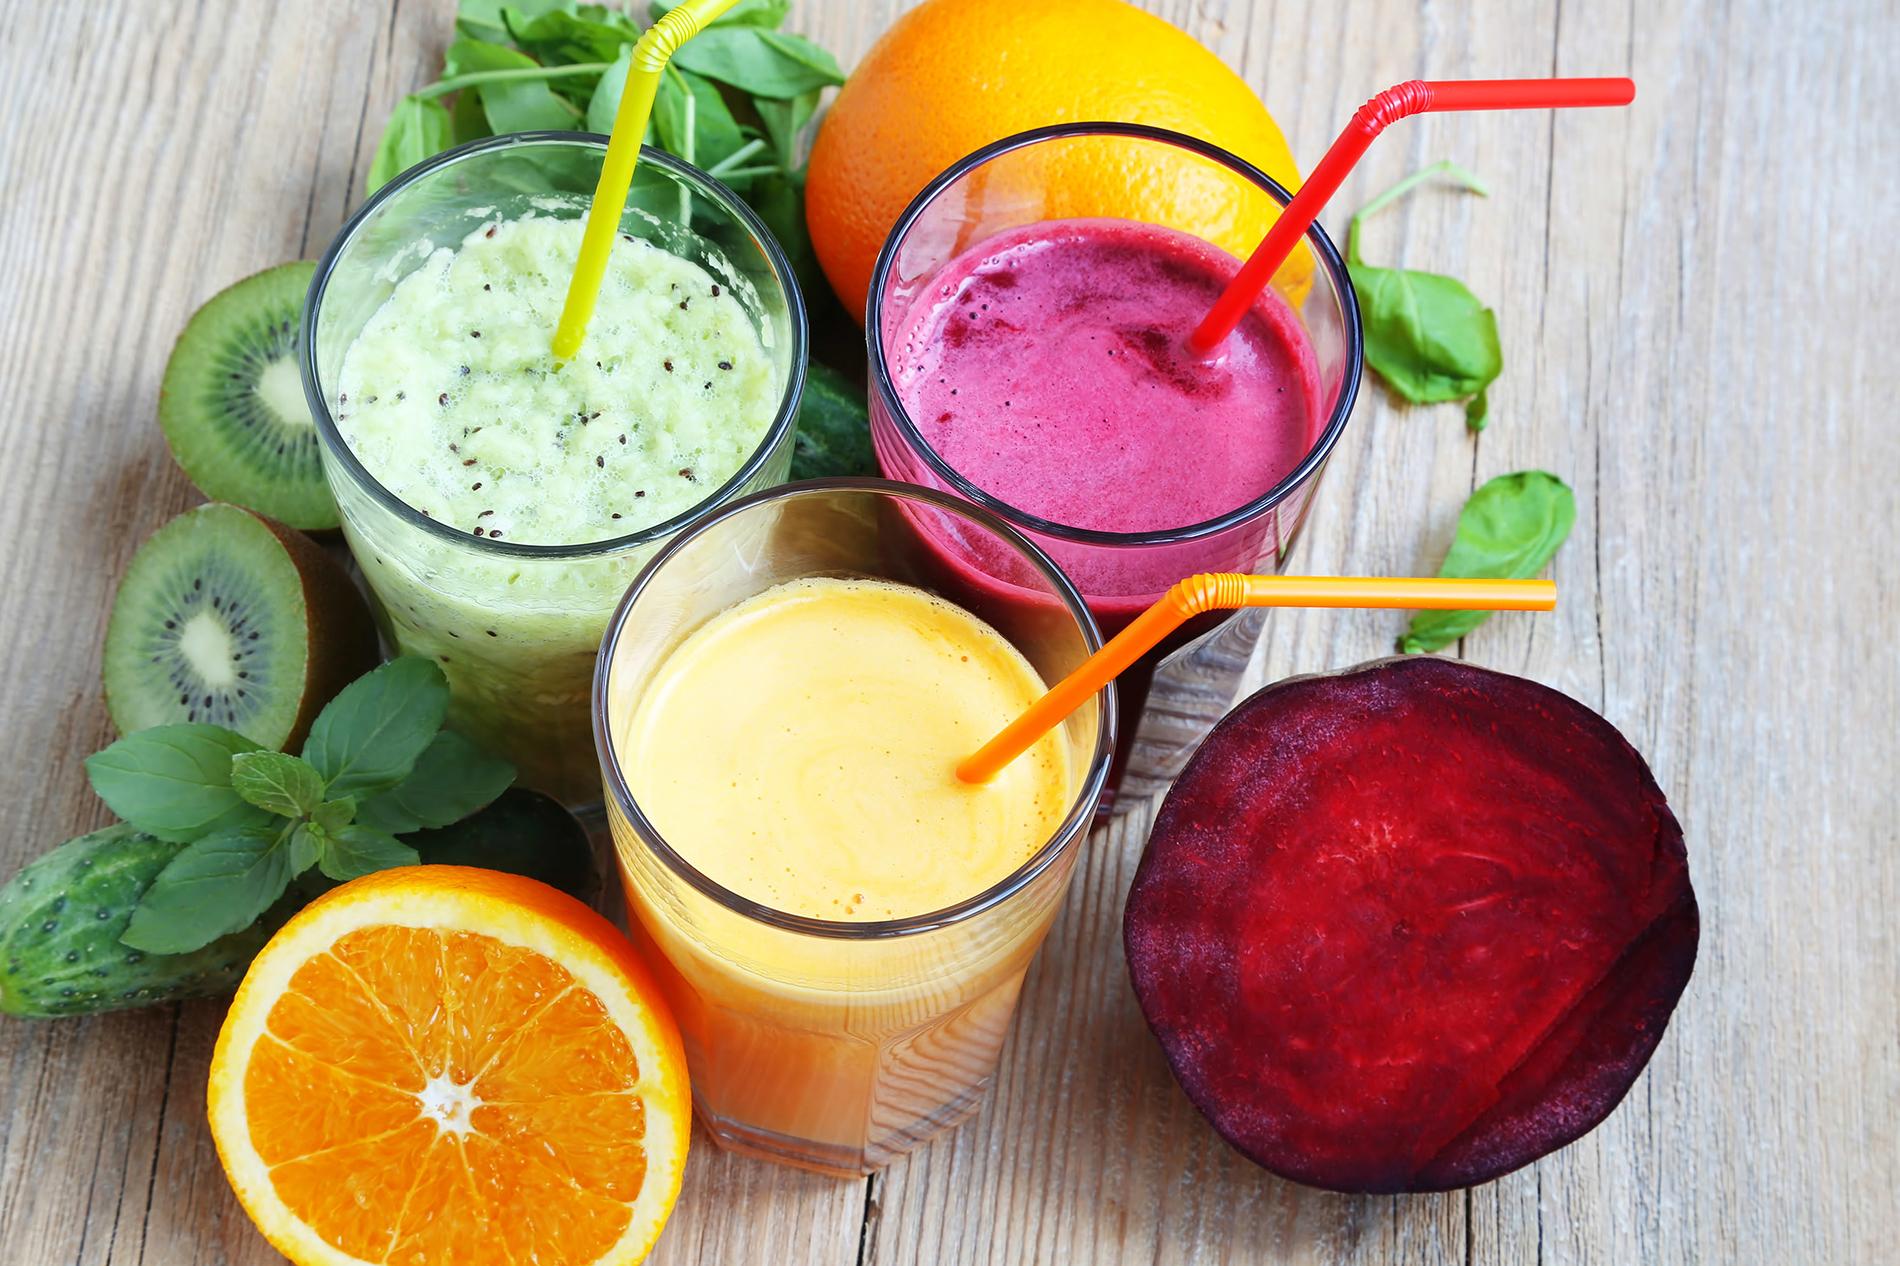 Insert-straws-juice.jpg